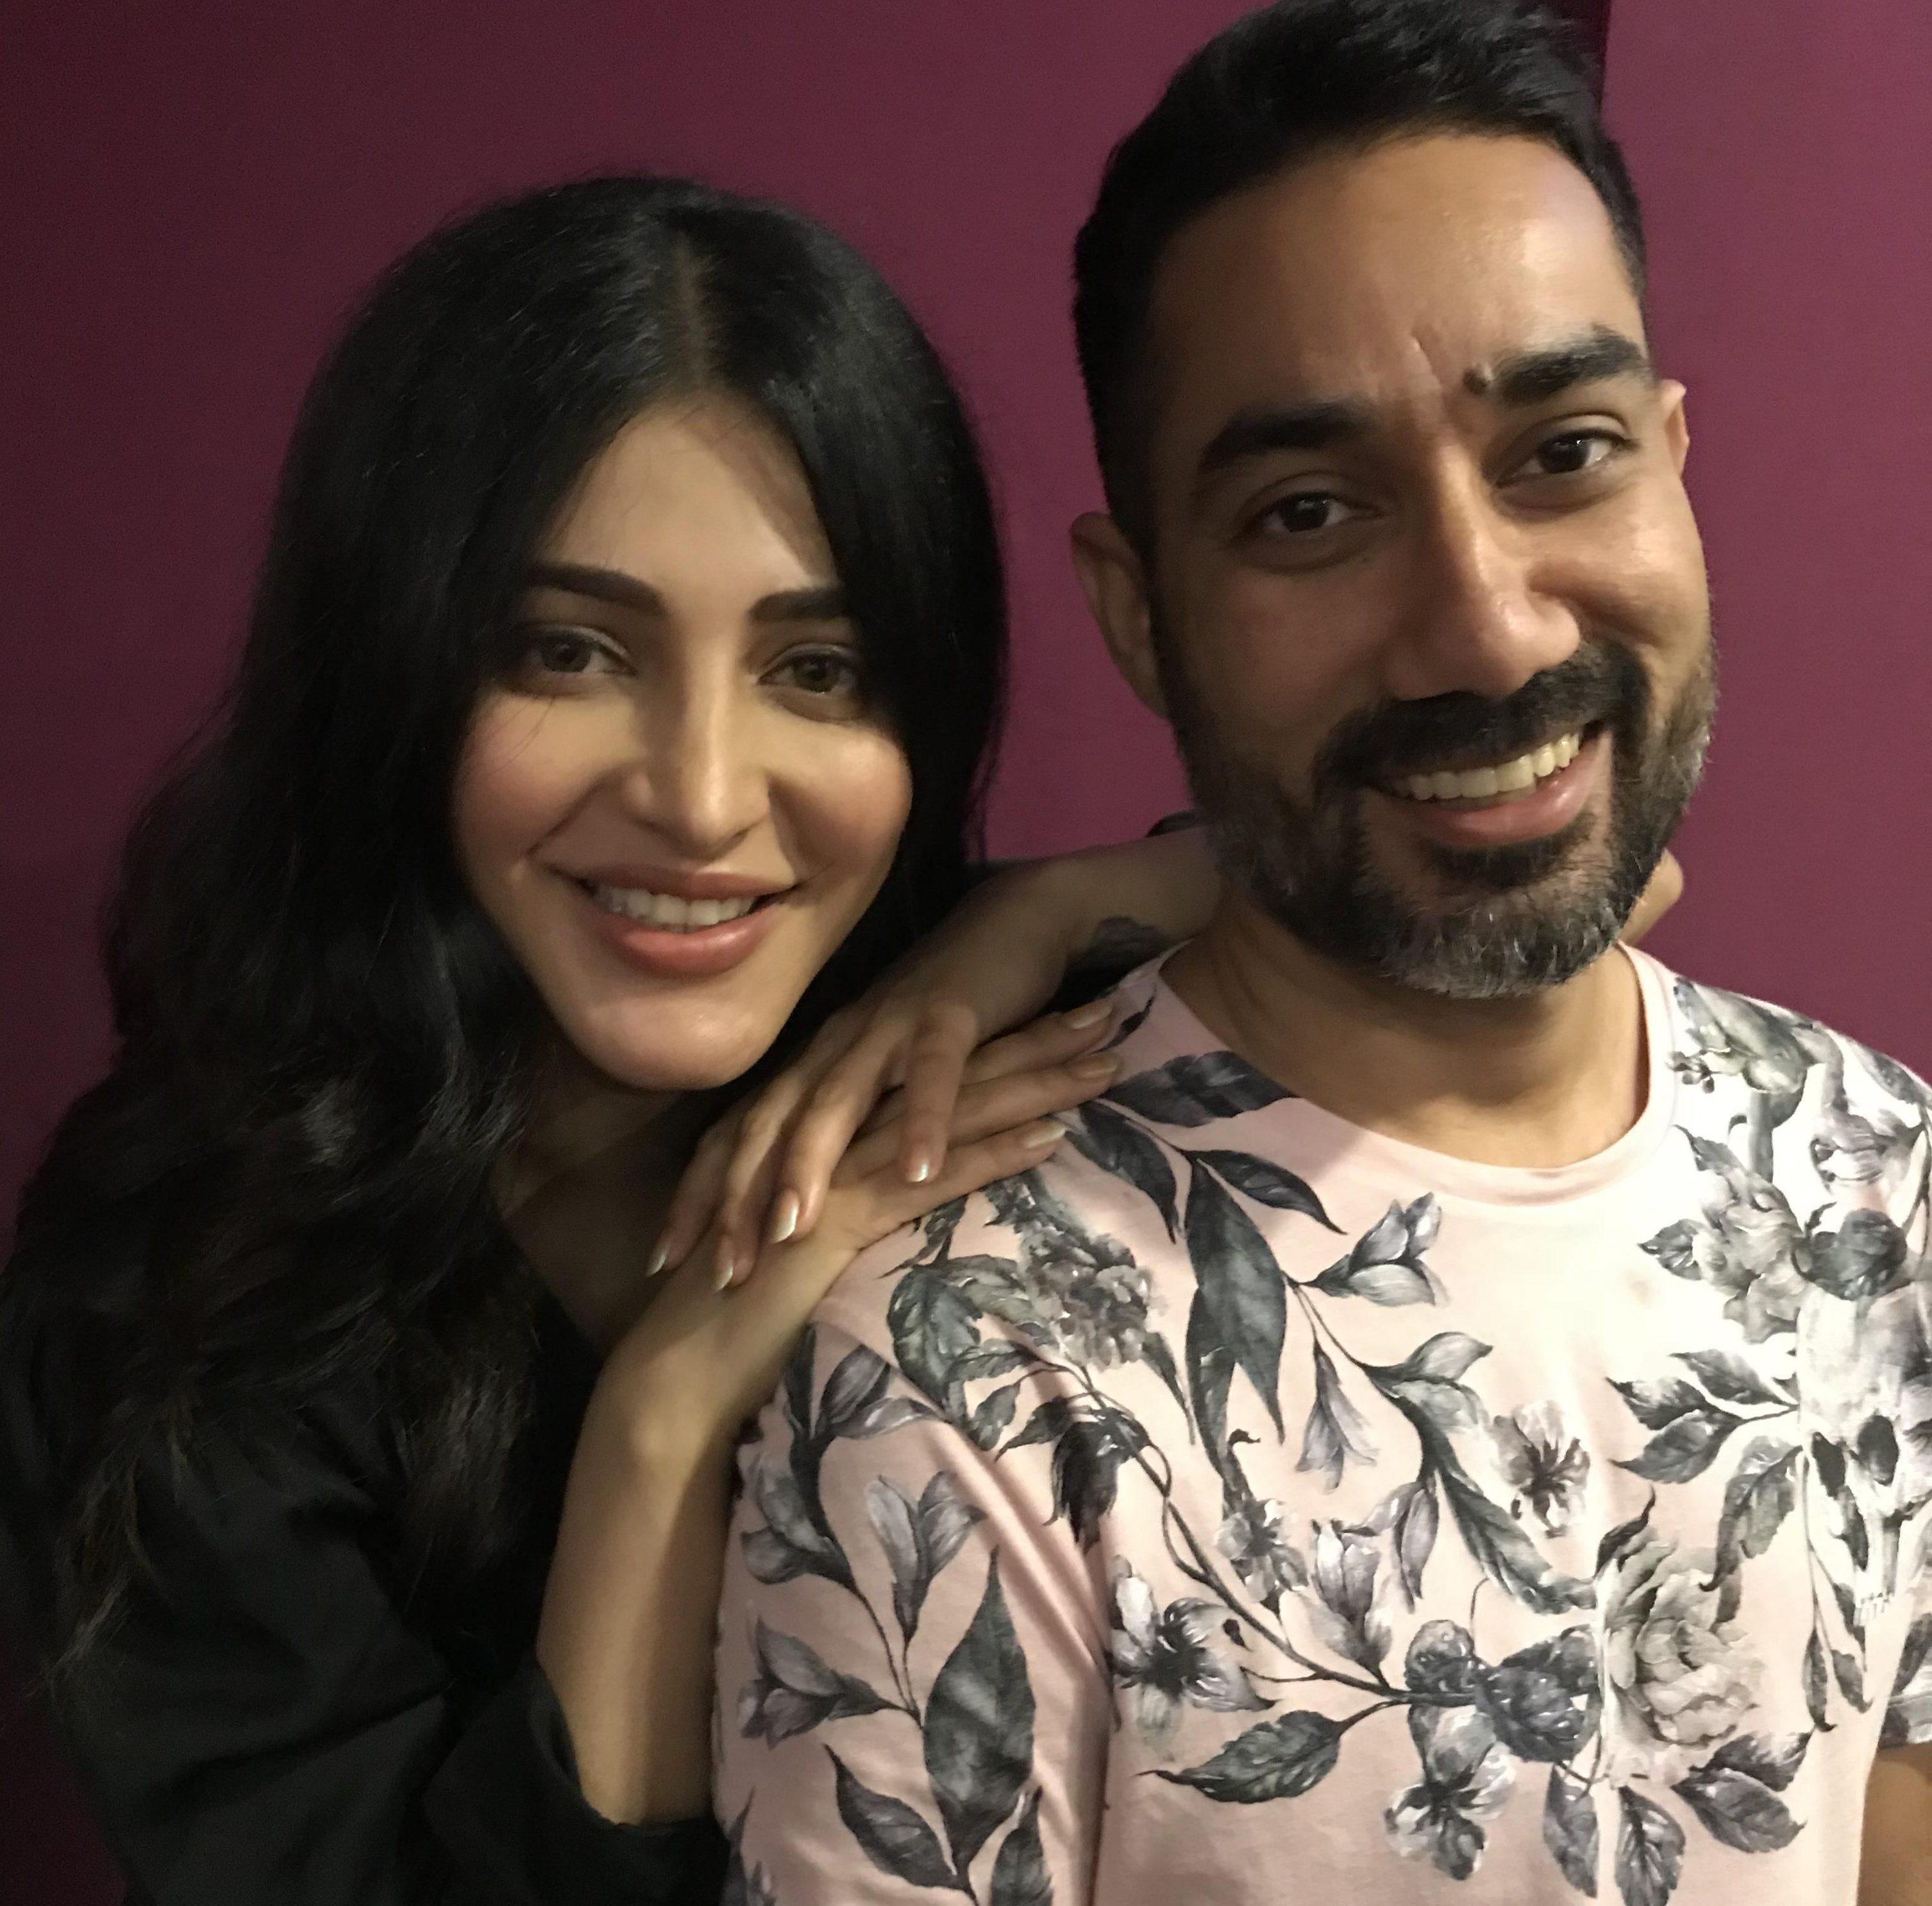 10 Embarrassing Bollywood Songs That'll Make You Go WTF! - GoodTimes: Lifestyle, Food, Travel, Fashion, Weddings, Bollywood, Tech, Videos & Photos